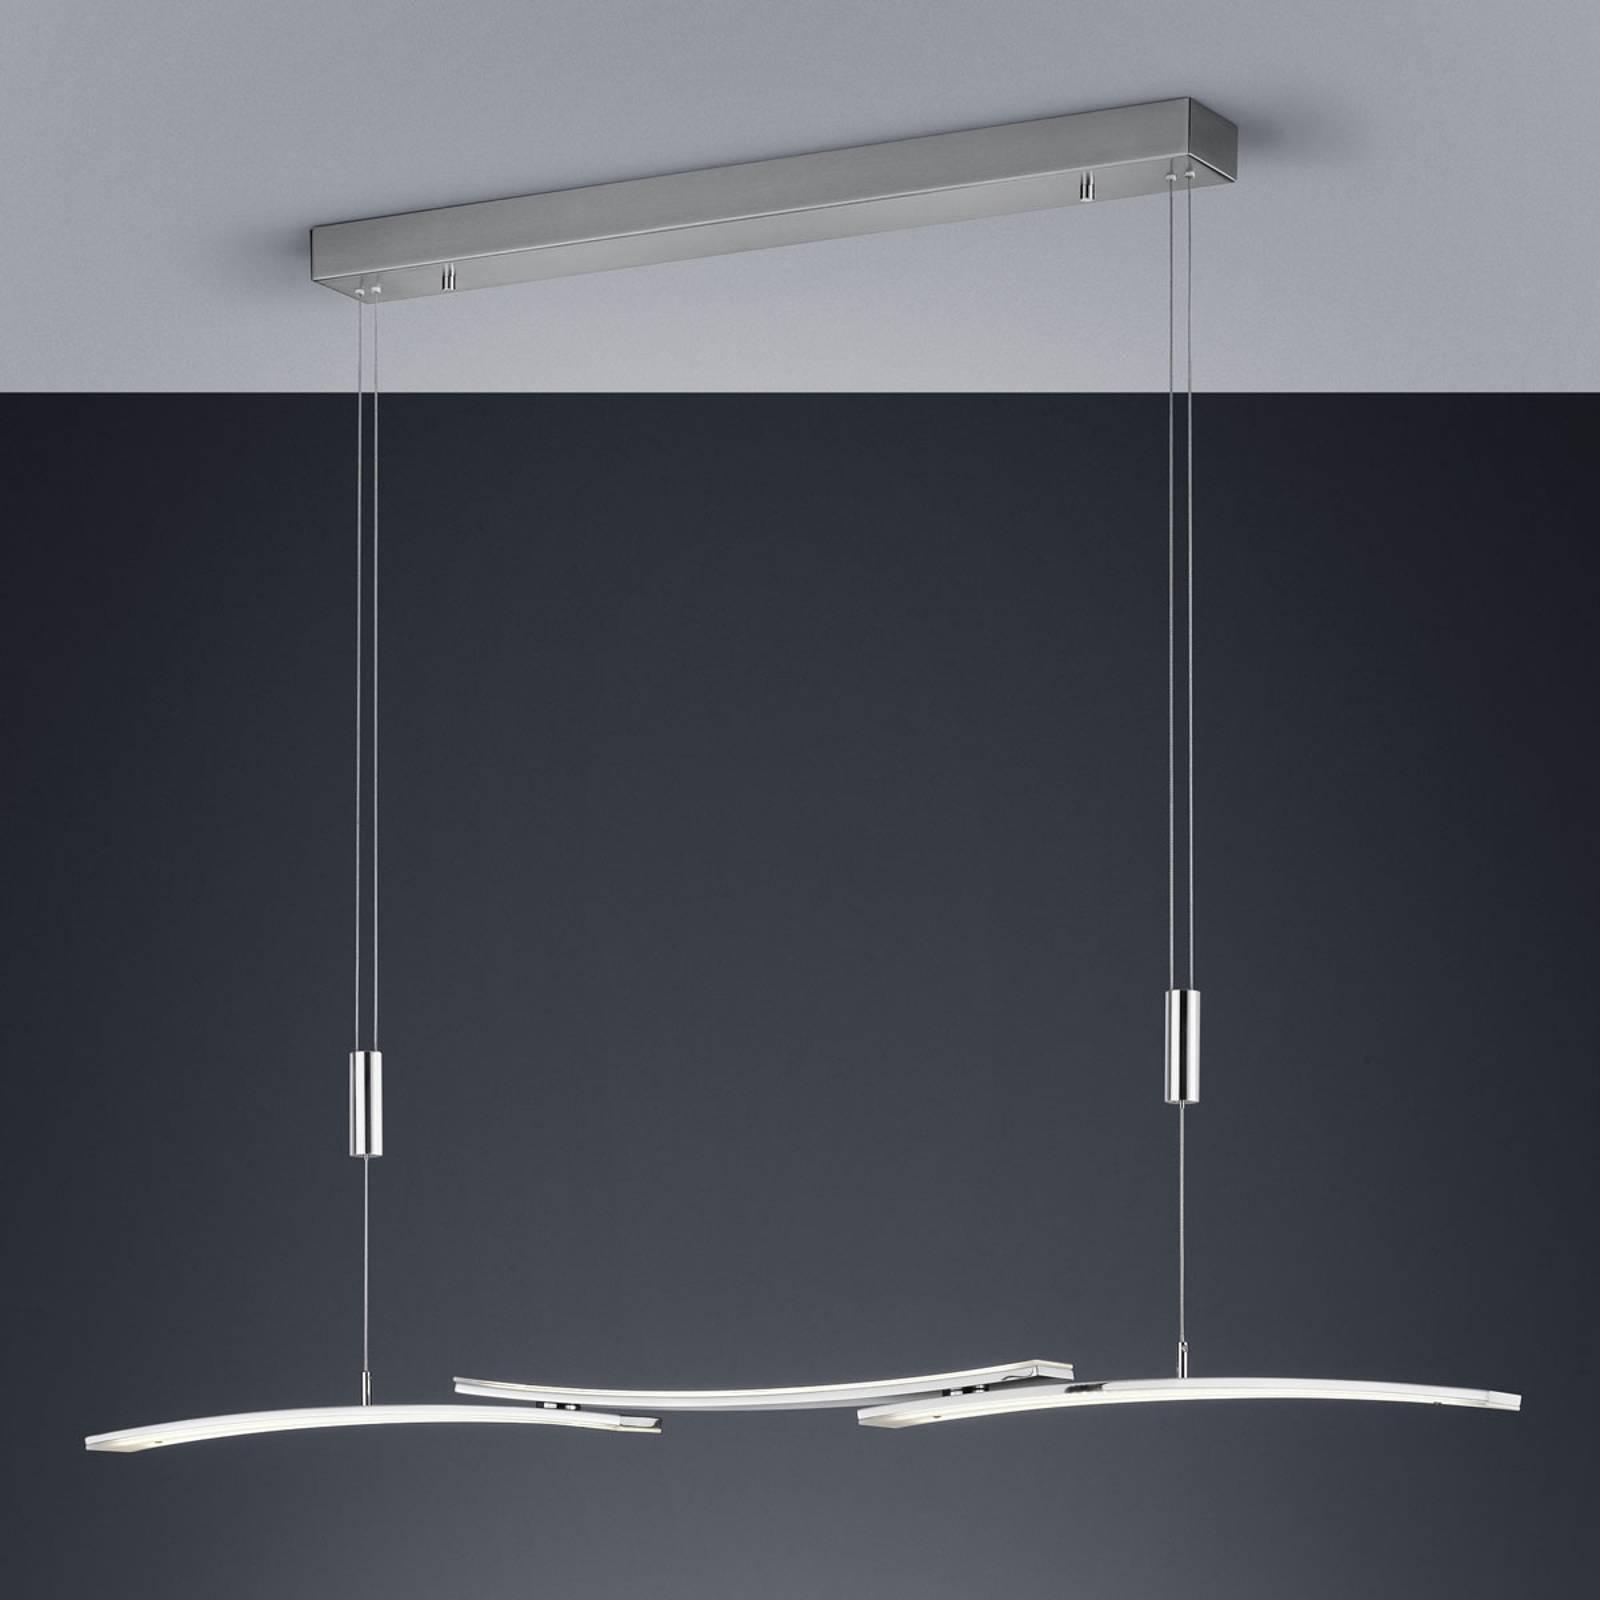 BANKAMP 2138/3-92 lampa wisząca LED, nikiel matowy